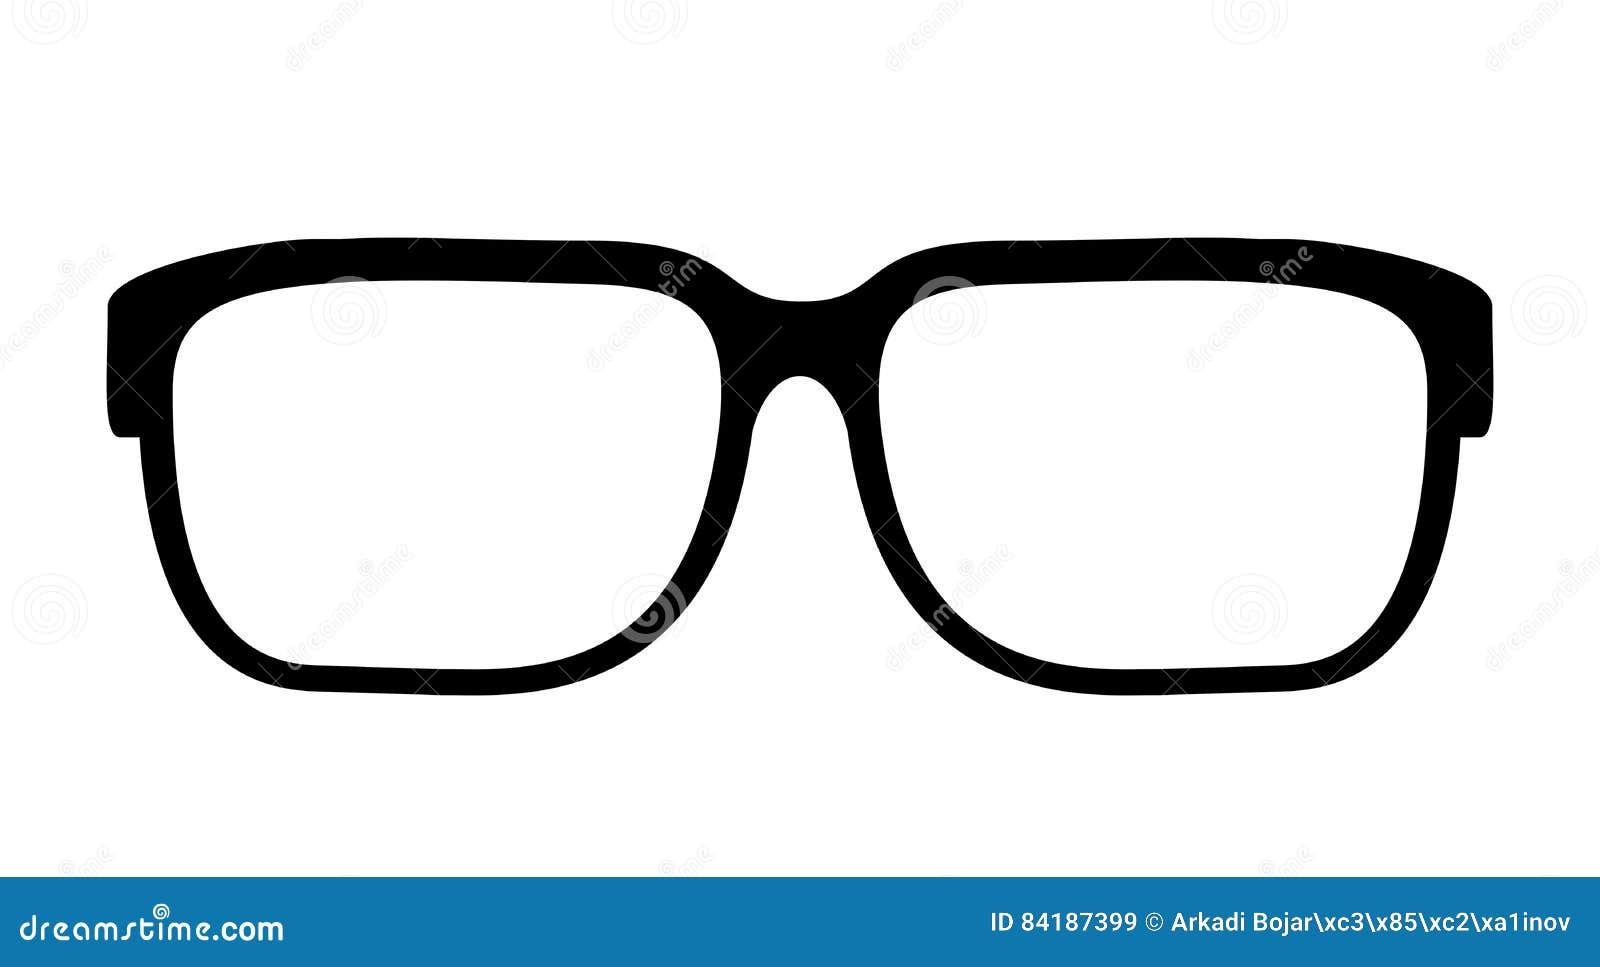 0e895ca43a Eye glasses vector icon stock vector. Illustration of button - 84187399